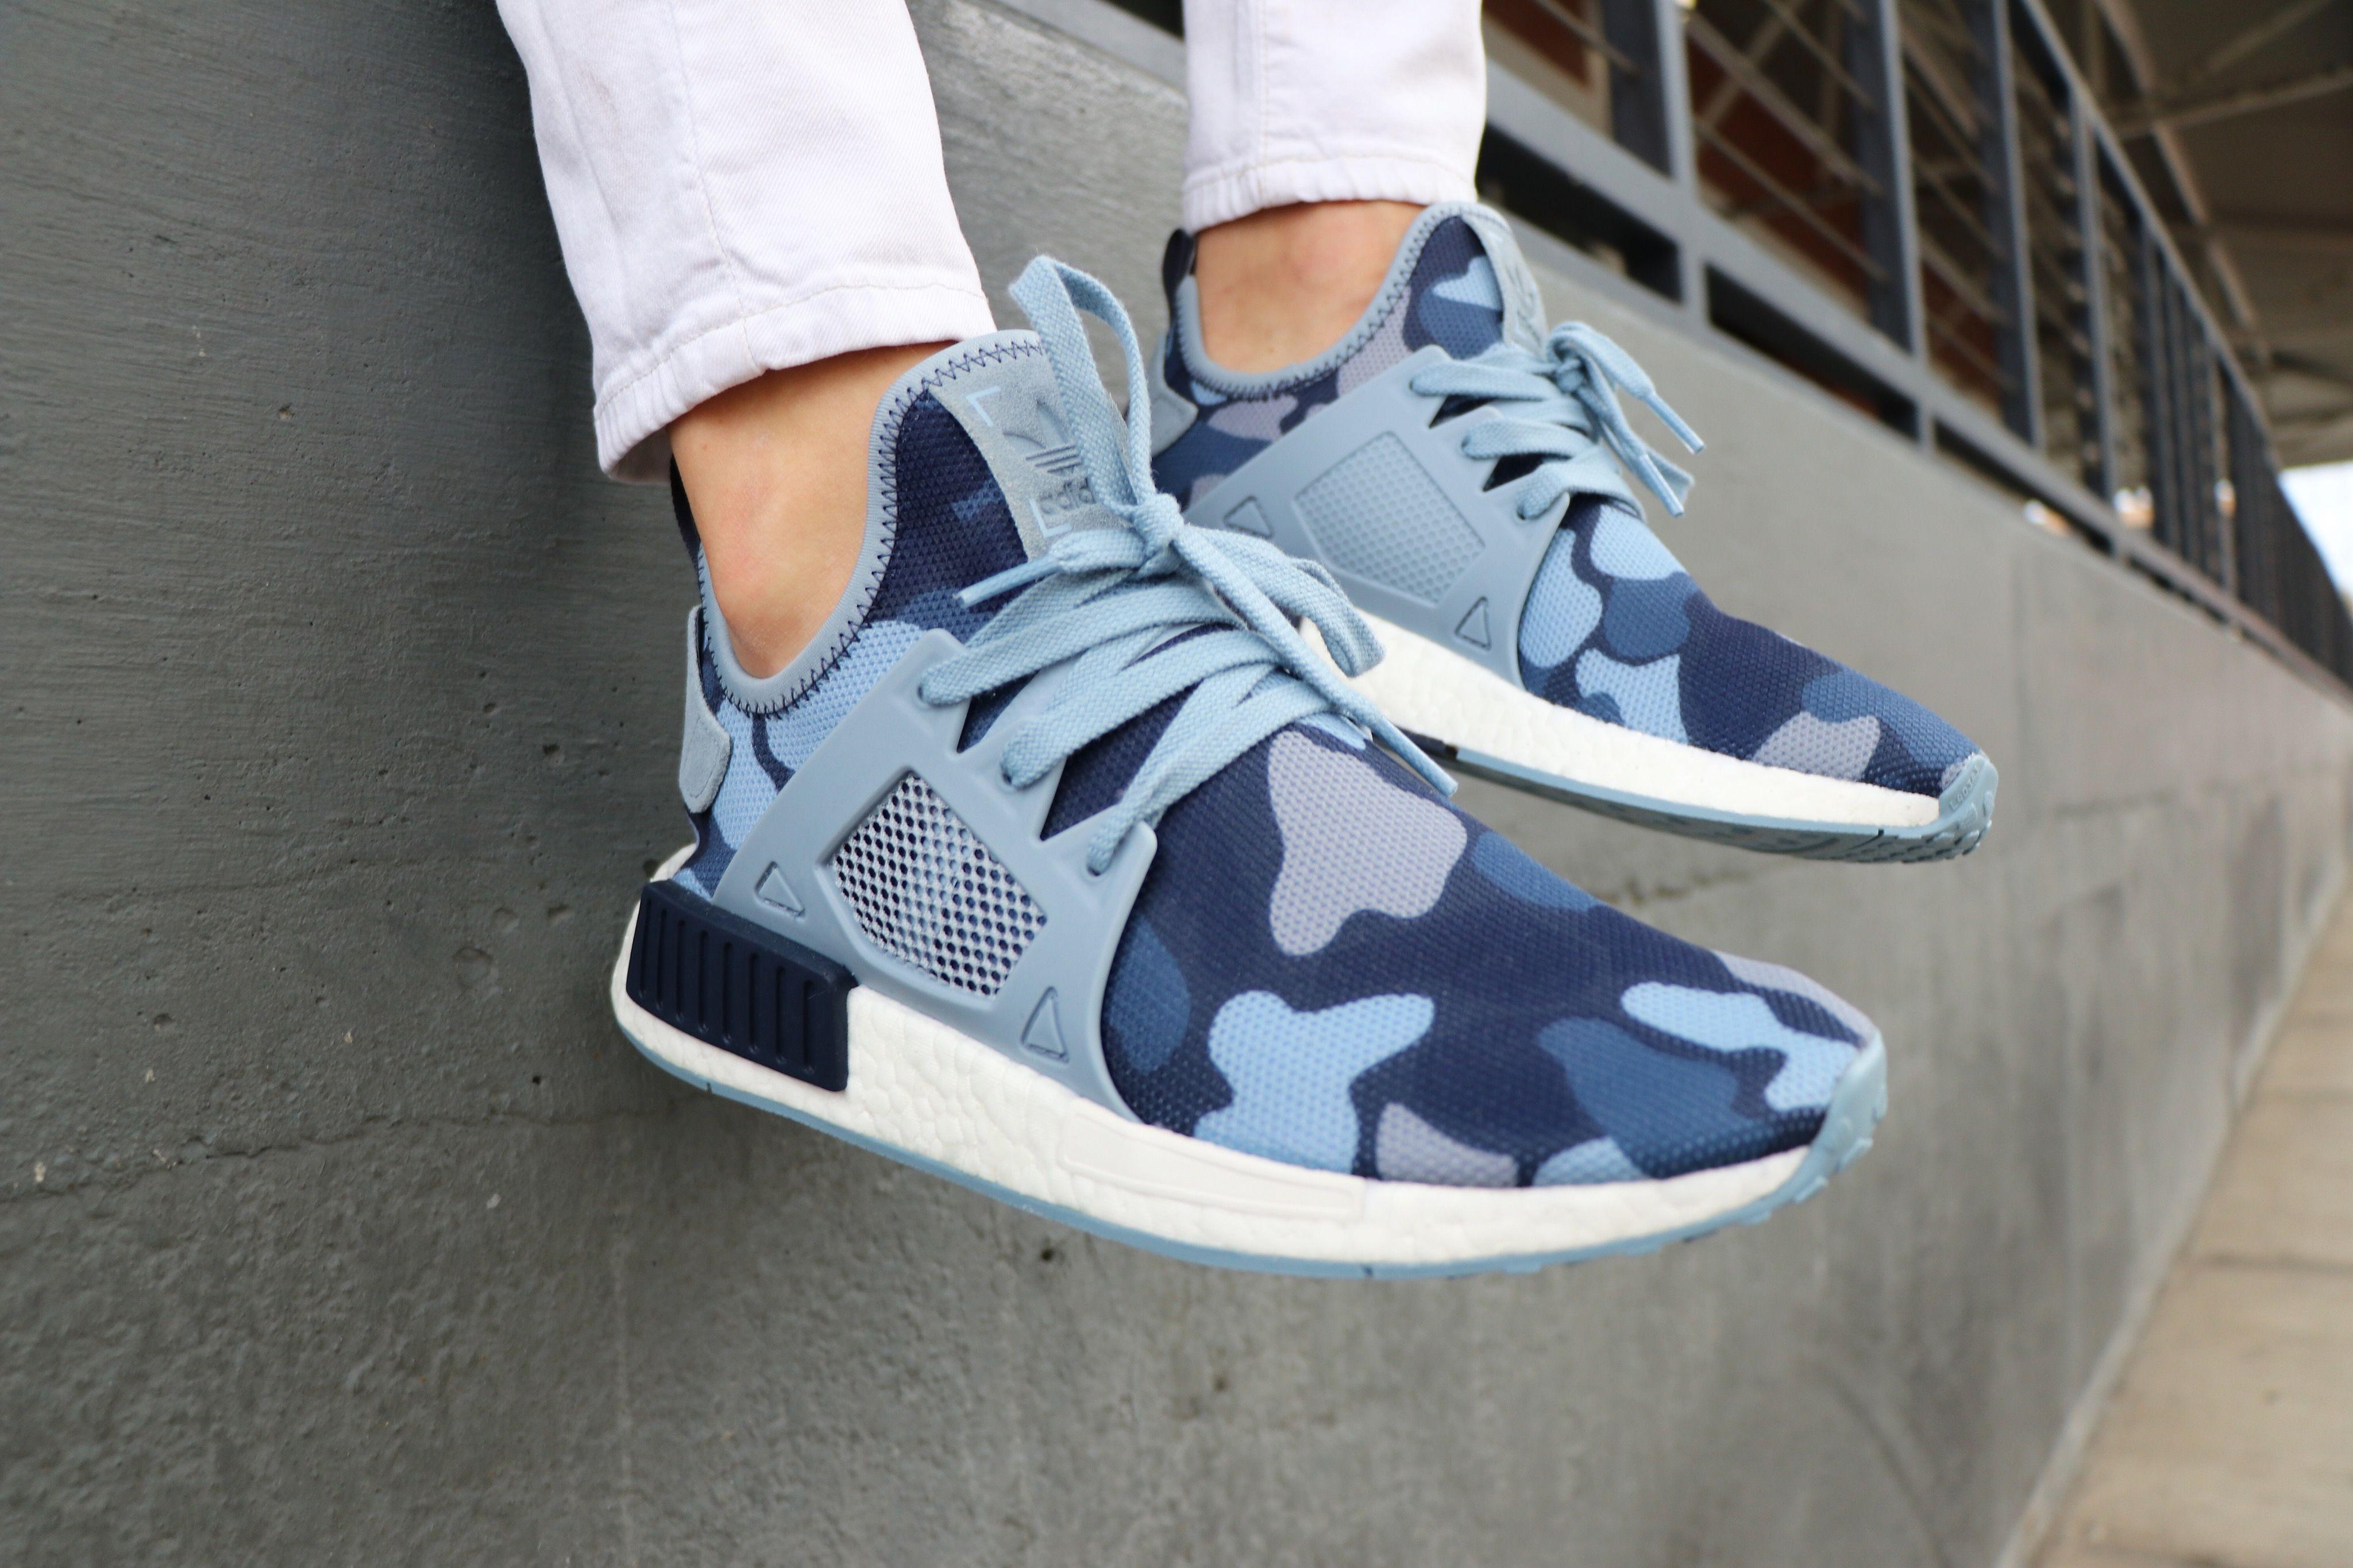 new concept f5f96 49654 NMDXR1 Blue Duck Camo • • • • adidas nike nmd threestripes sneakers  sneakerhead sneaker hypebae hype nmdr1 sneakermyth nmdxr1